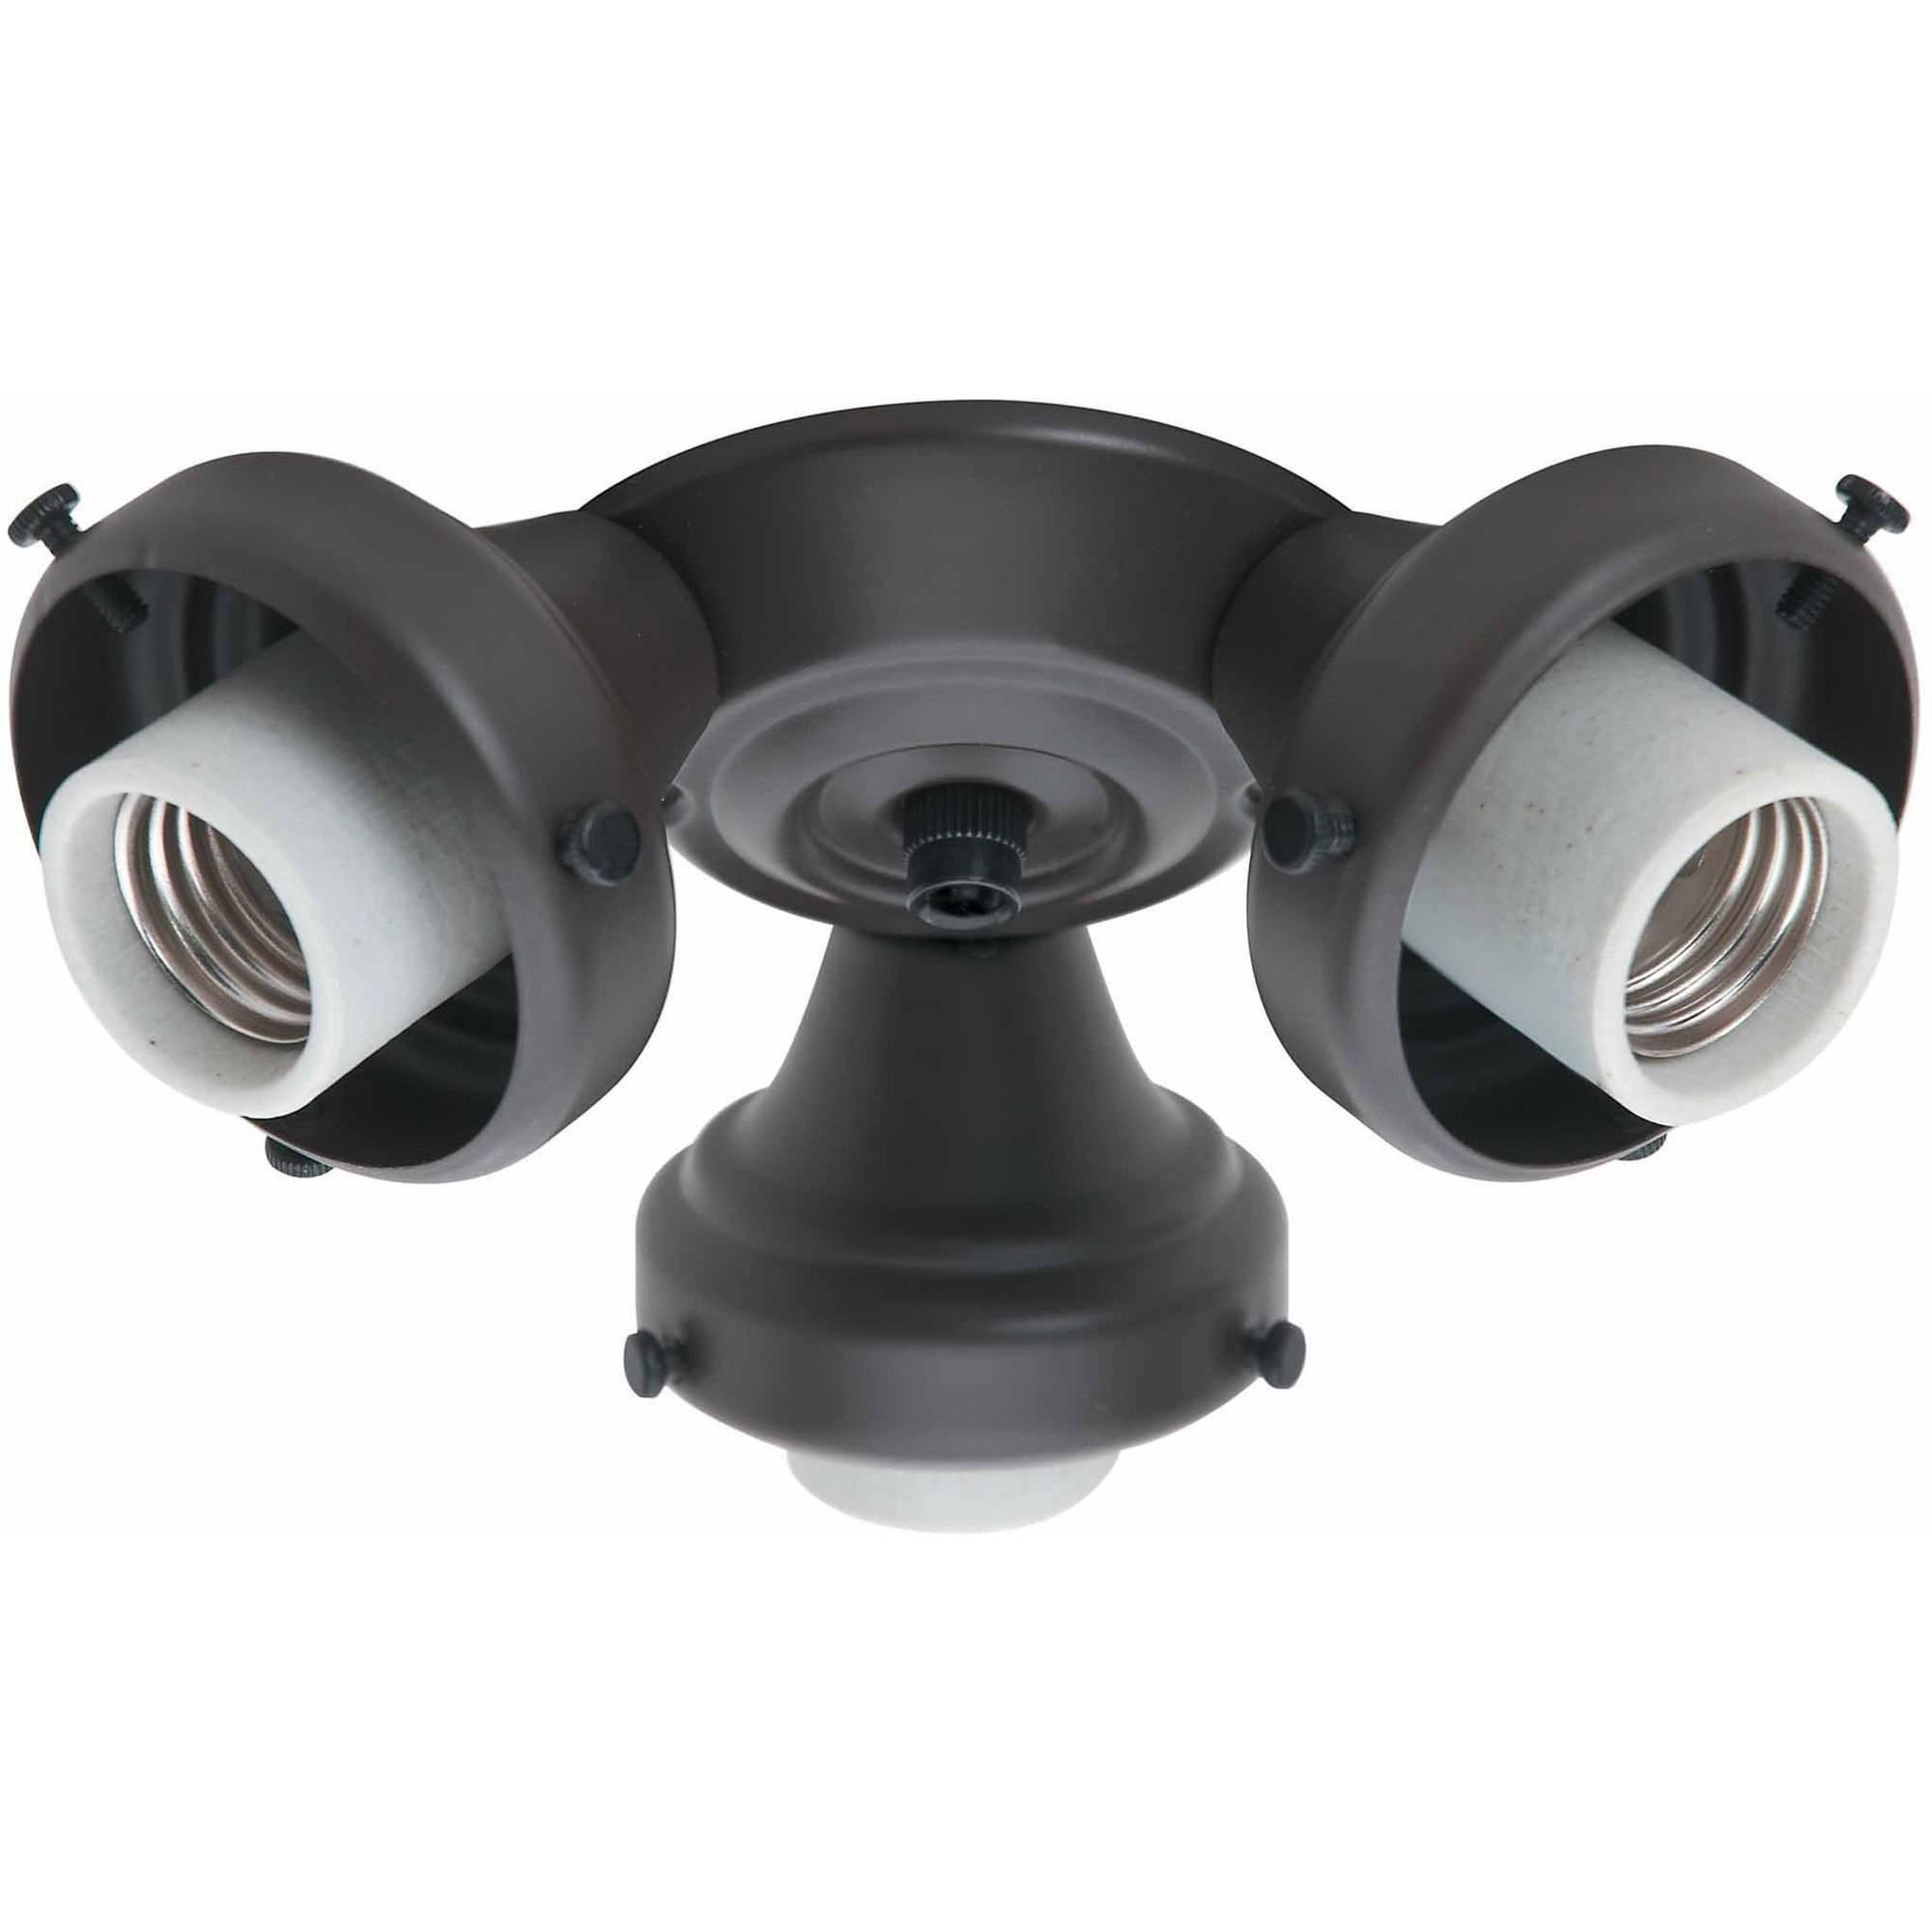 Hunter Fan Light 3 pany Fitter New Bronze 108 Top Reviews